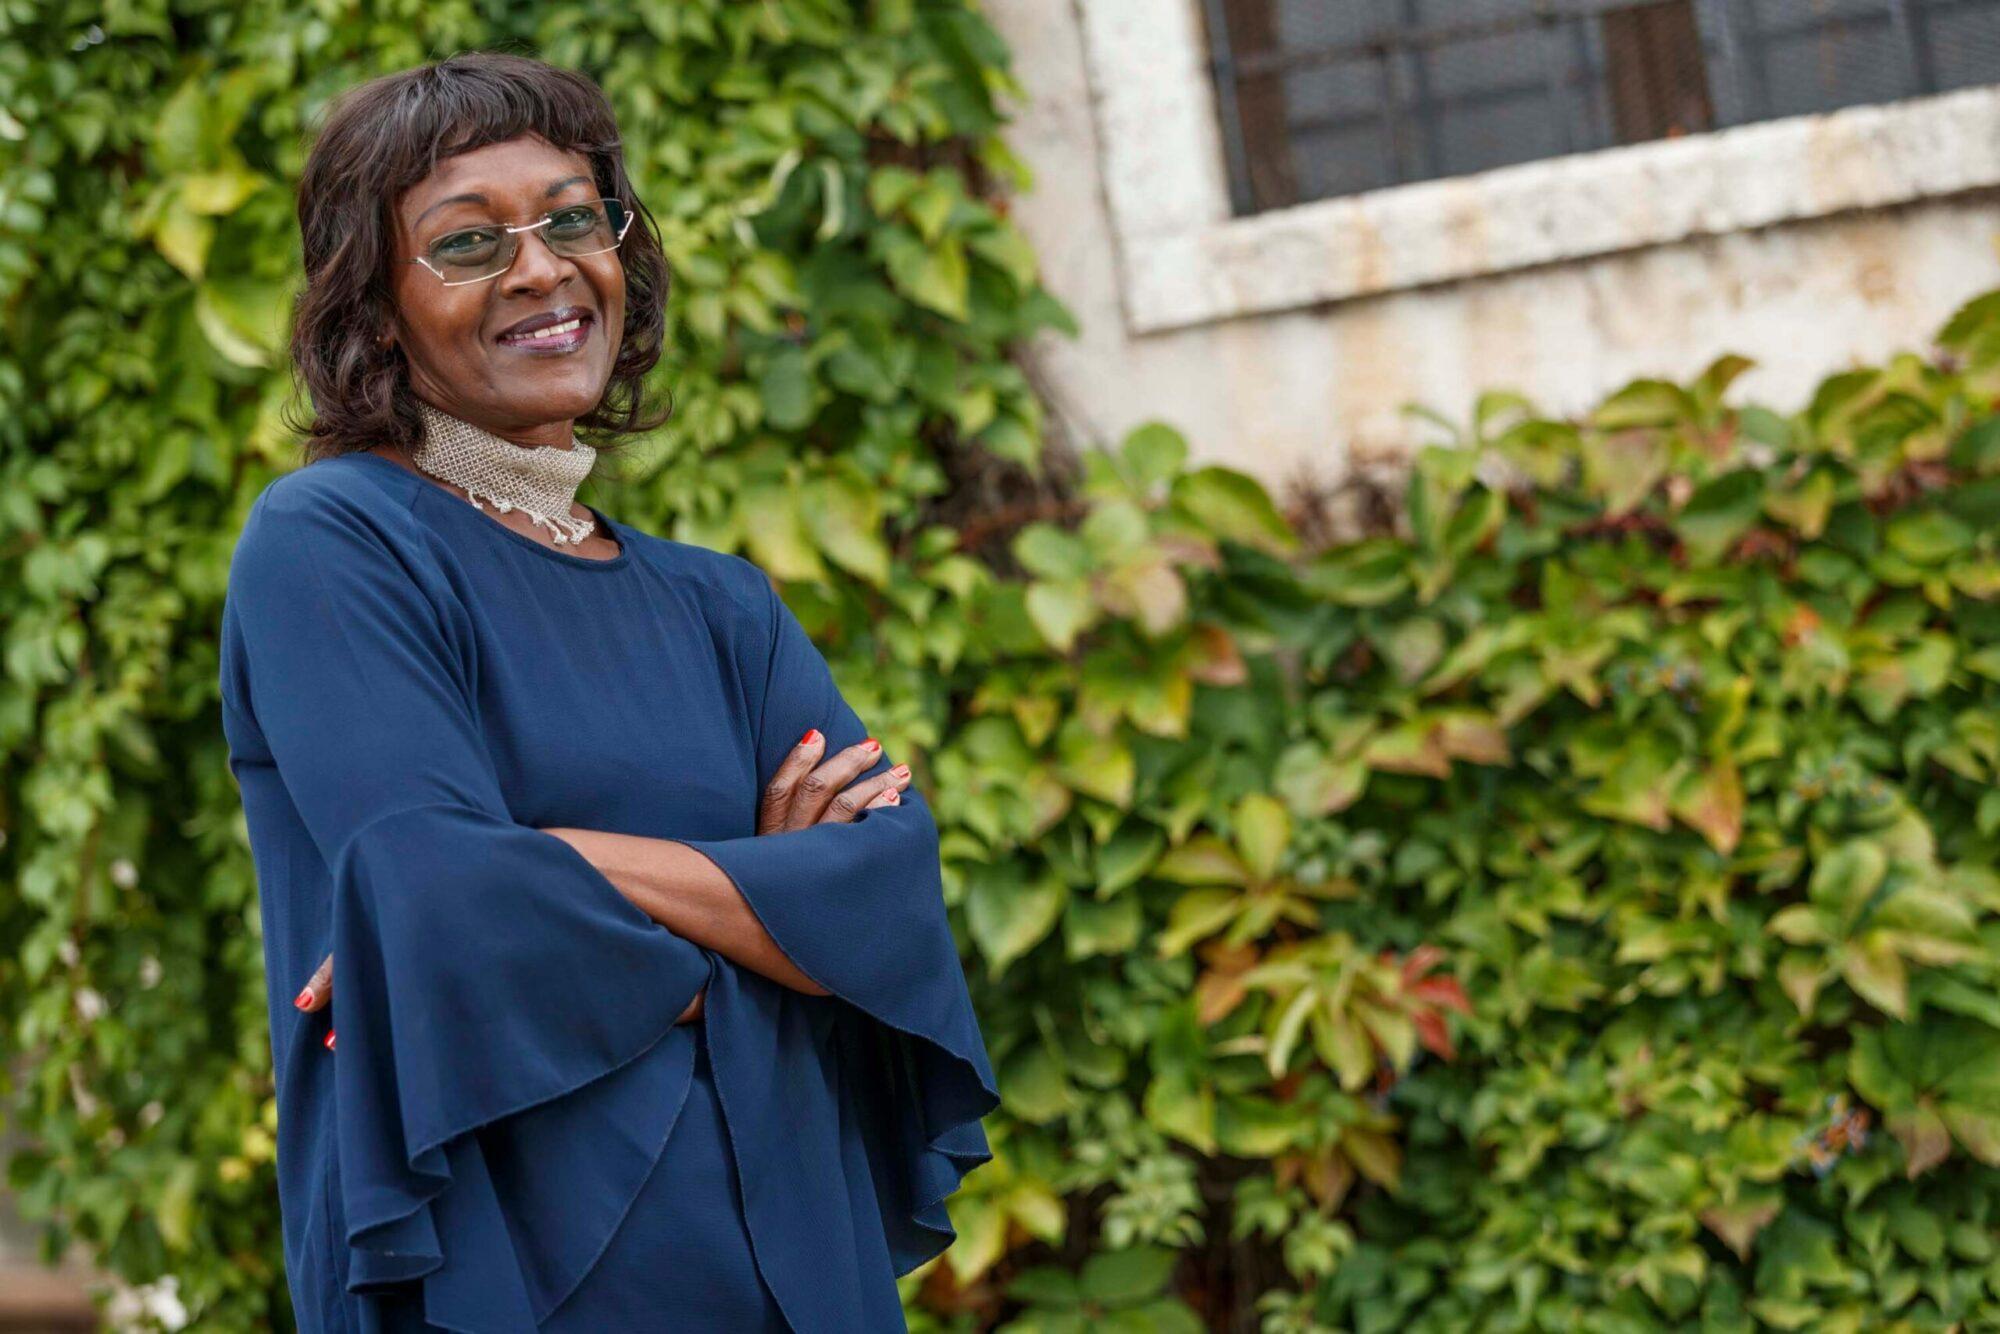 Yolande Mukagasana - Grosso d'oro veneziano 2017